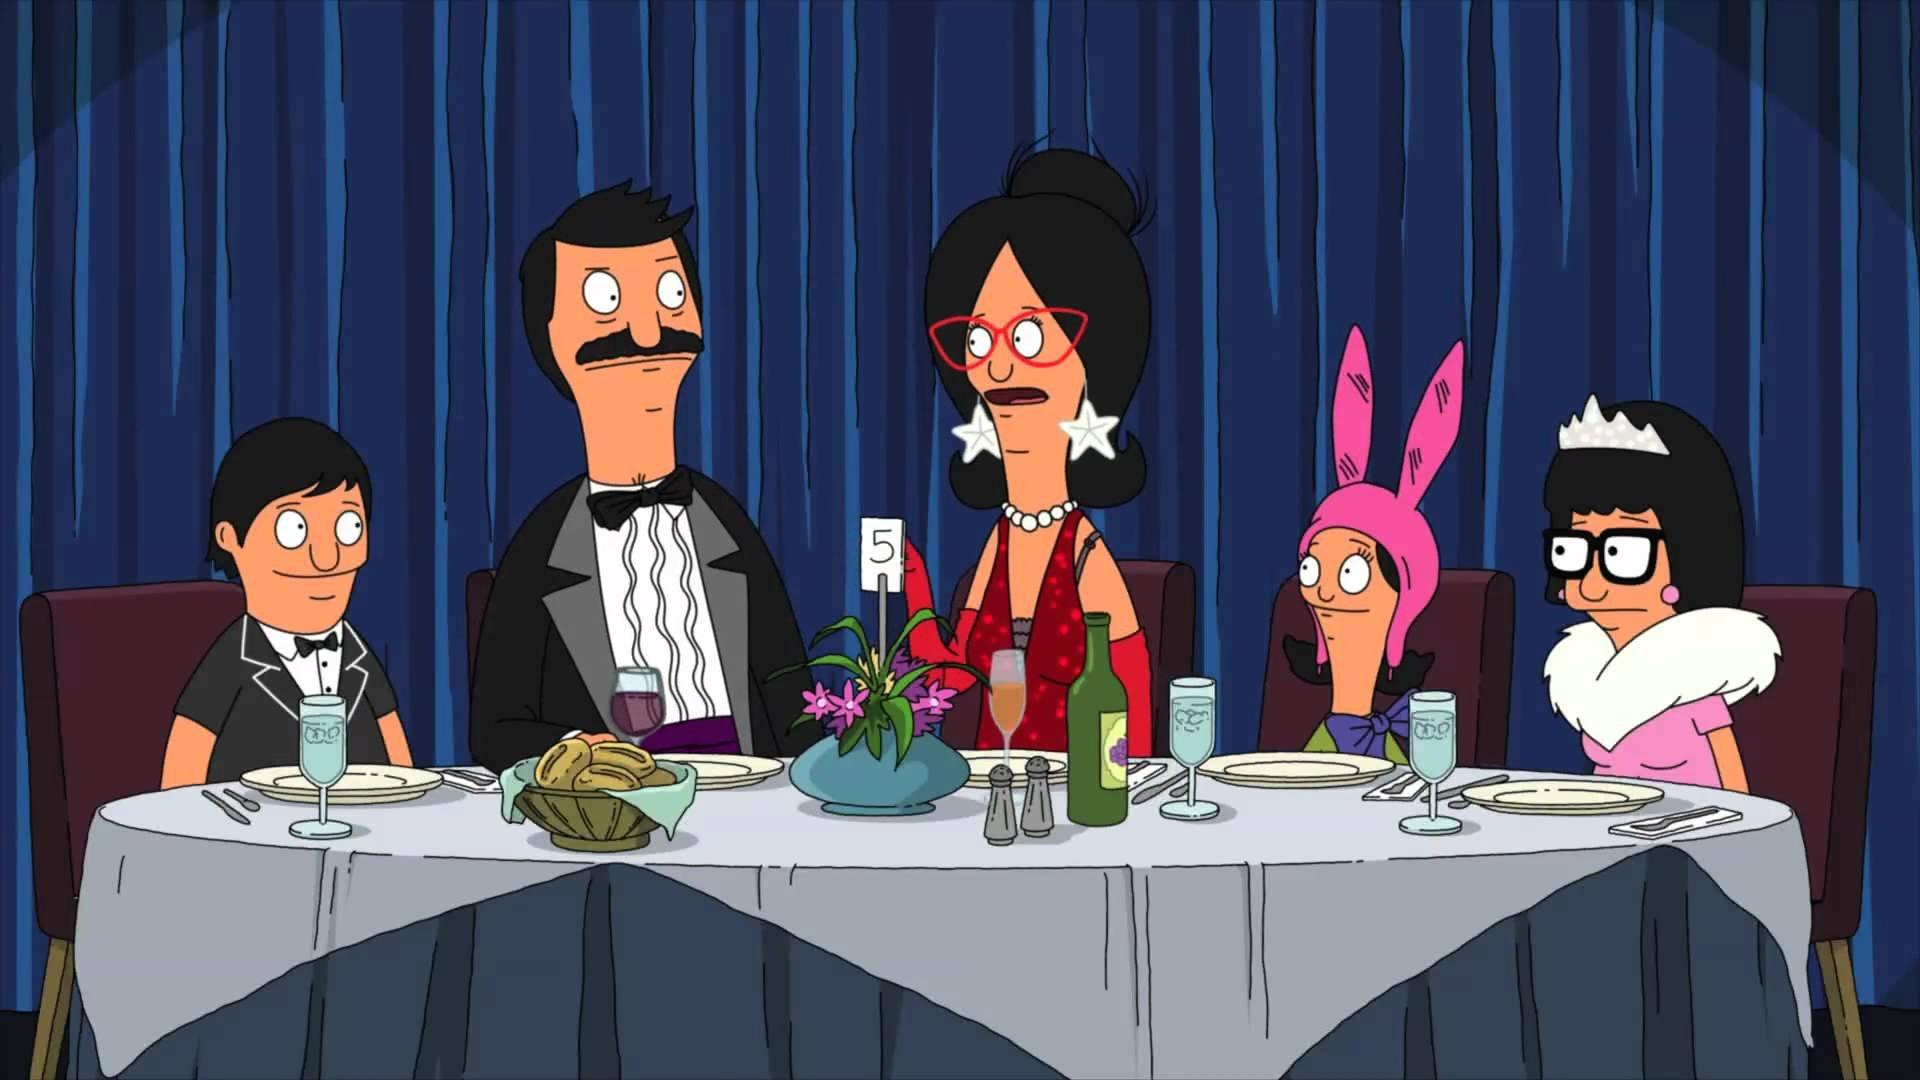 BOBS BURGERS animation comedy cartoon fox series family ...